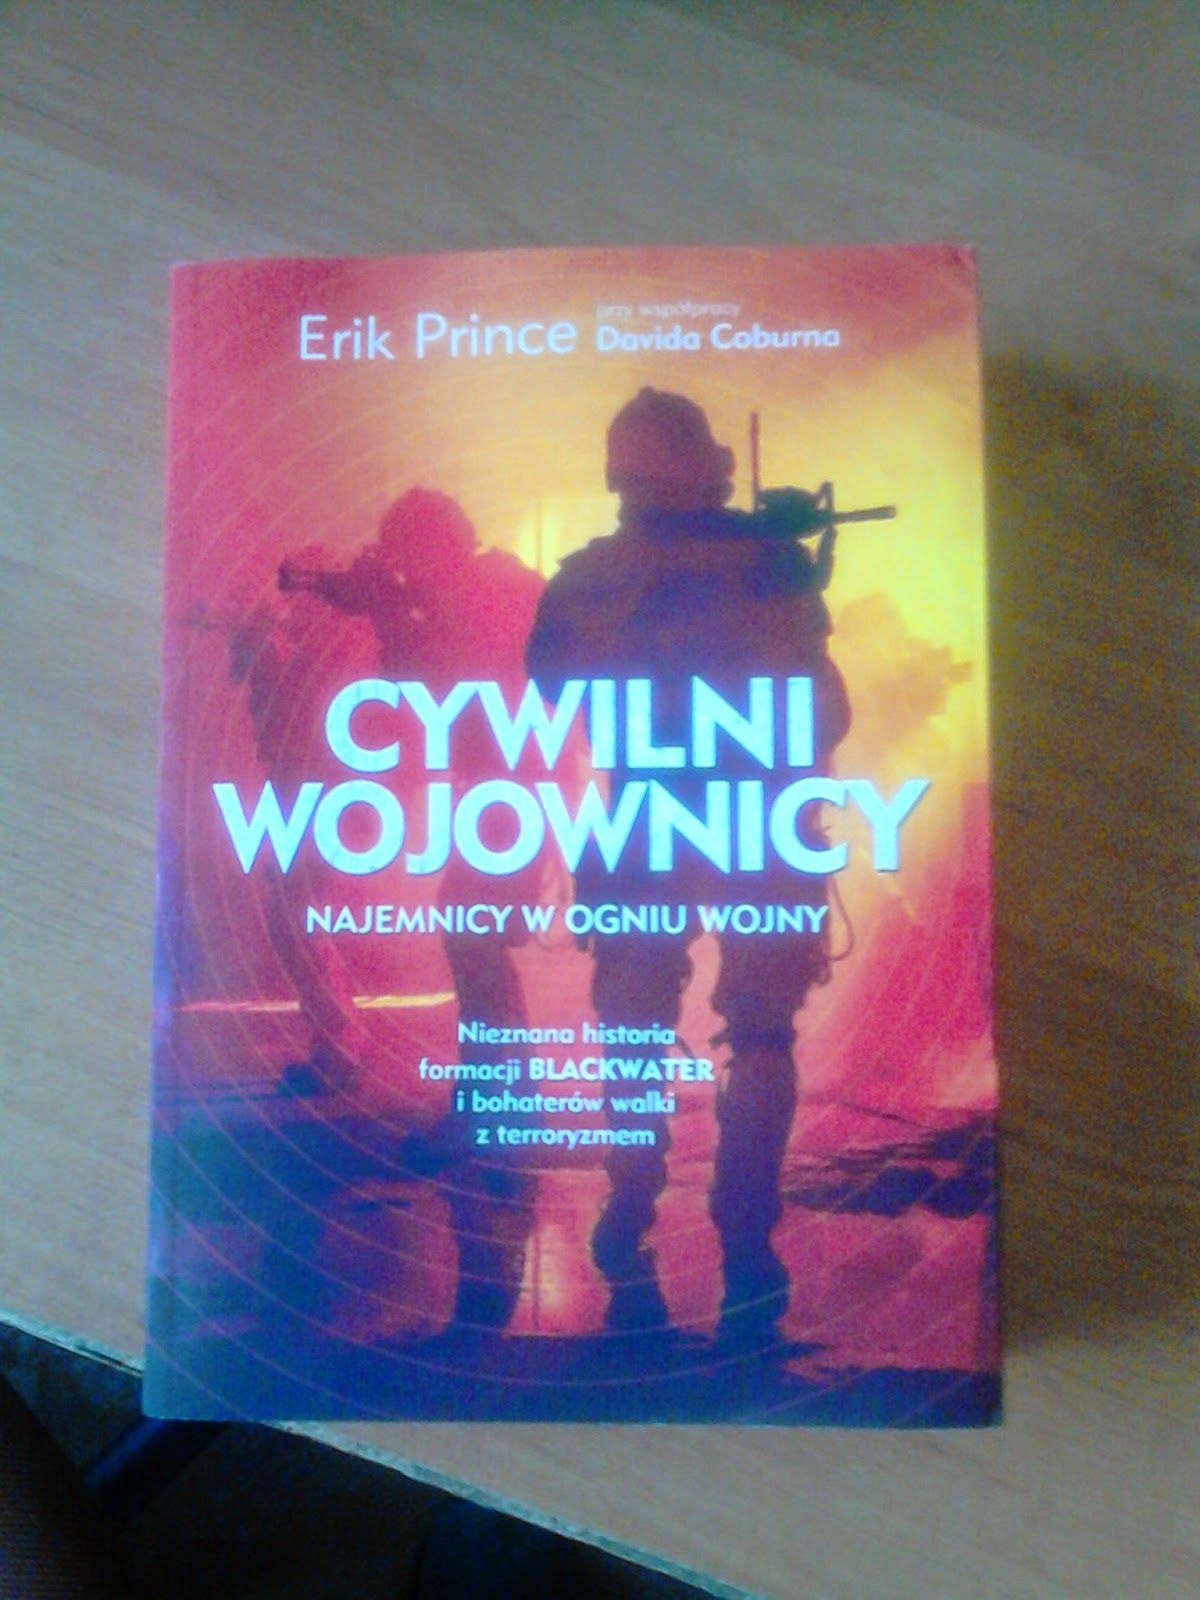 Erik Prince - Cywilni wojownicy